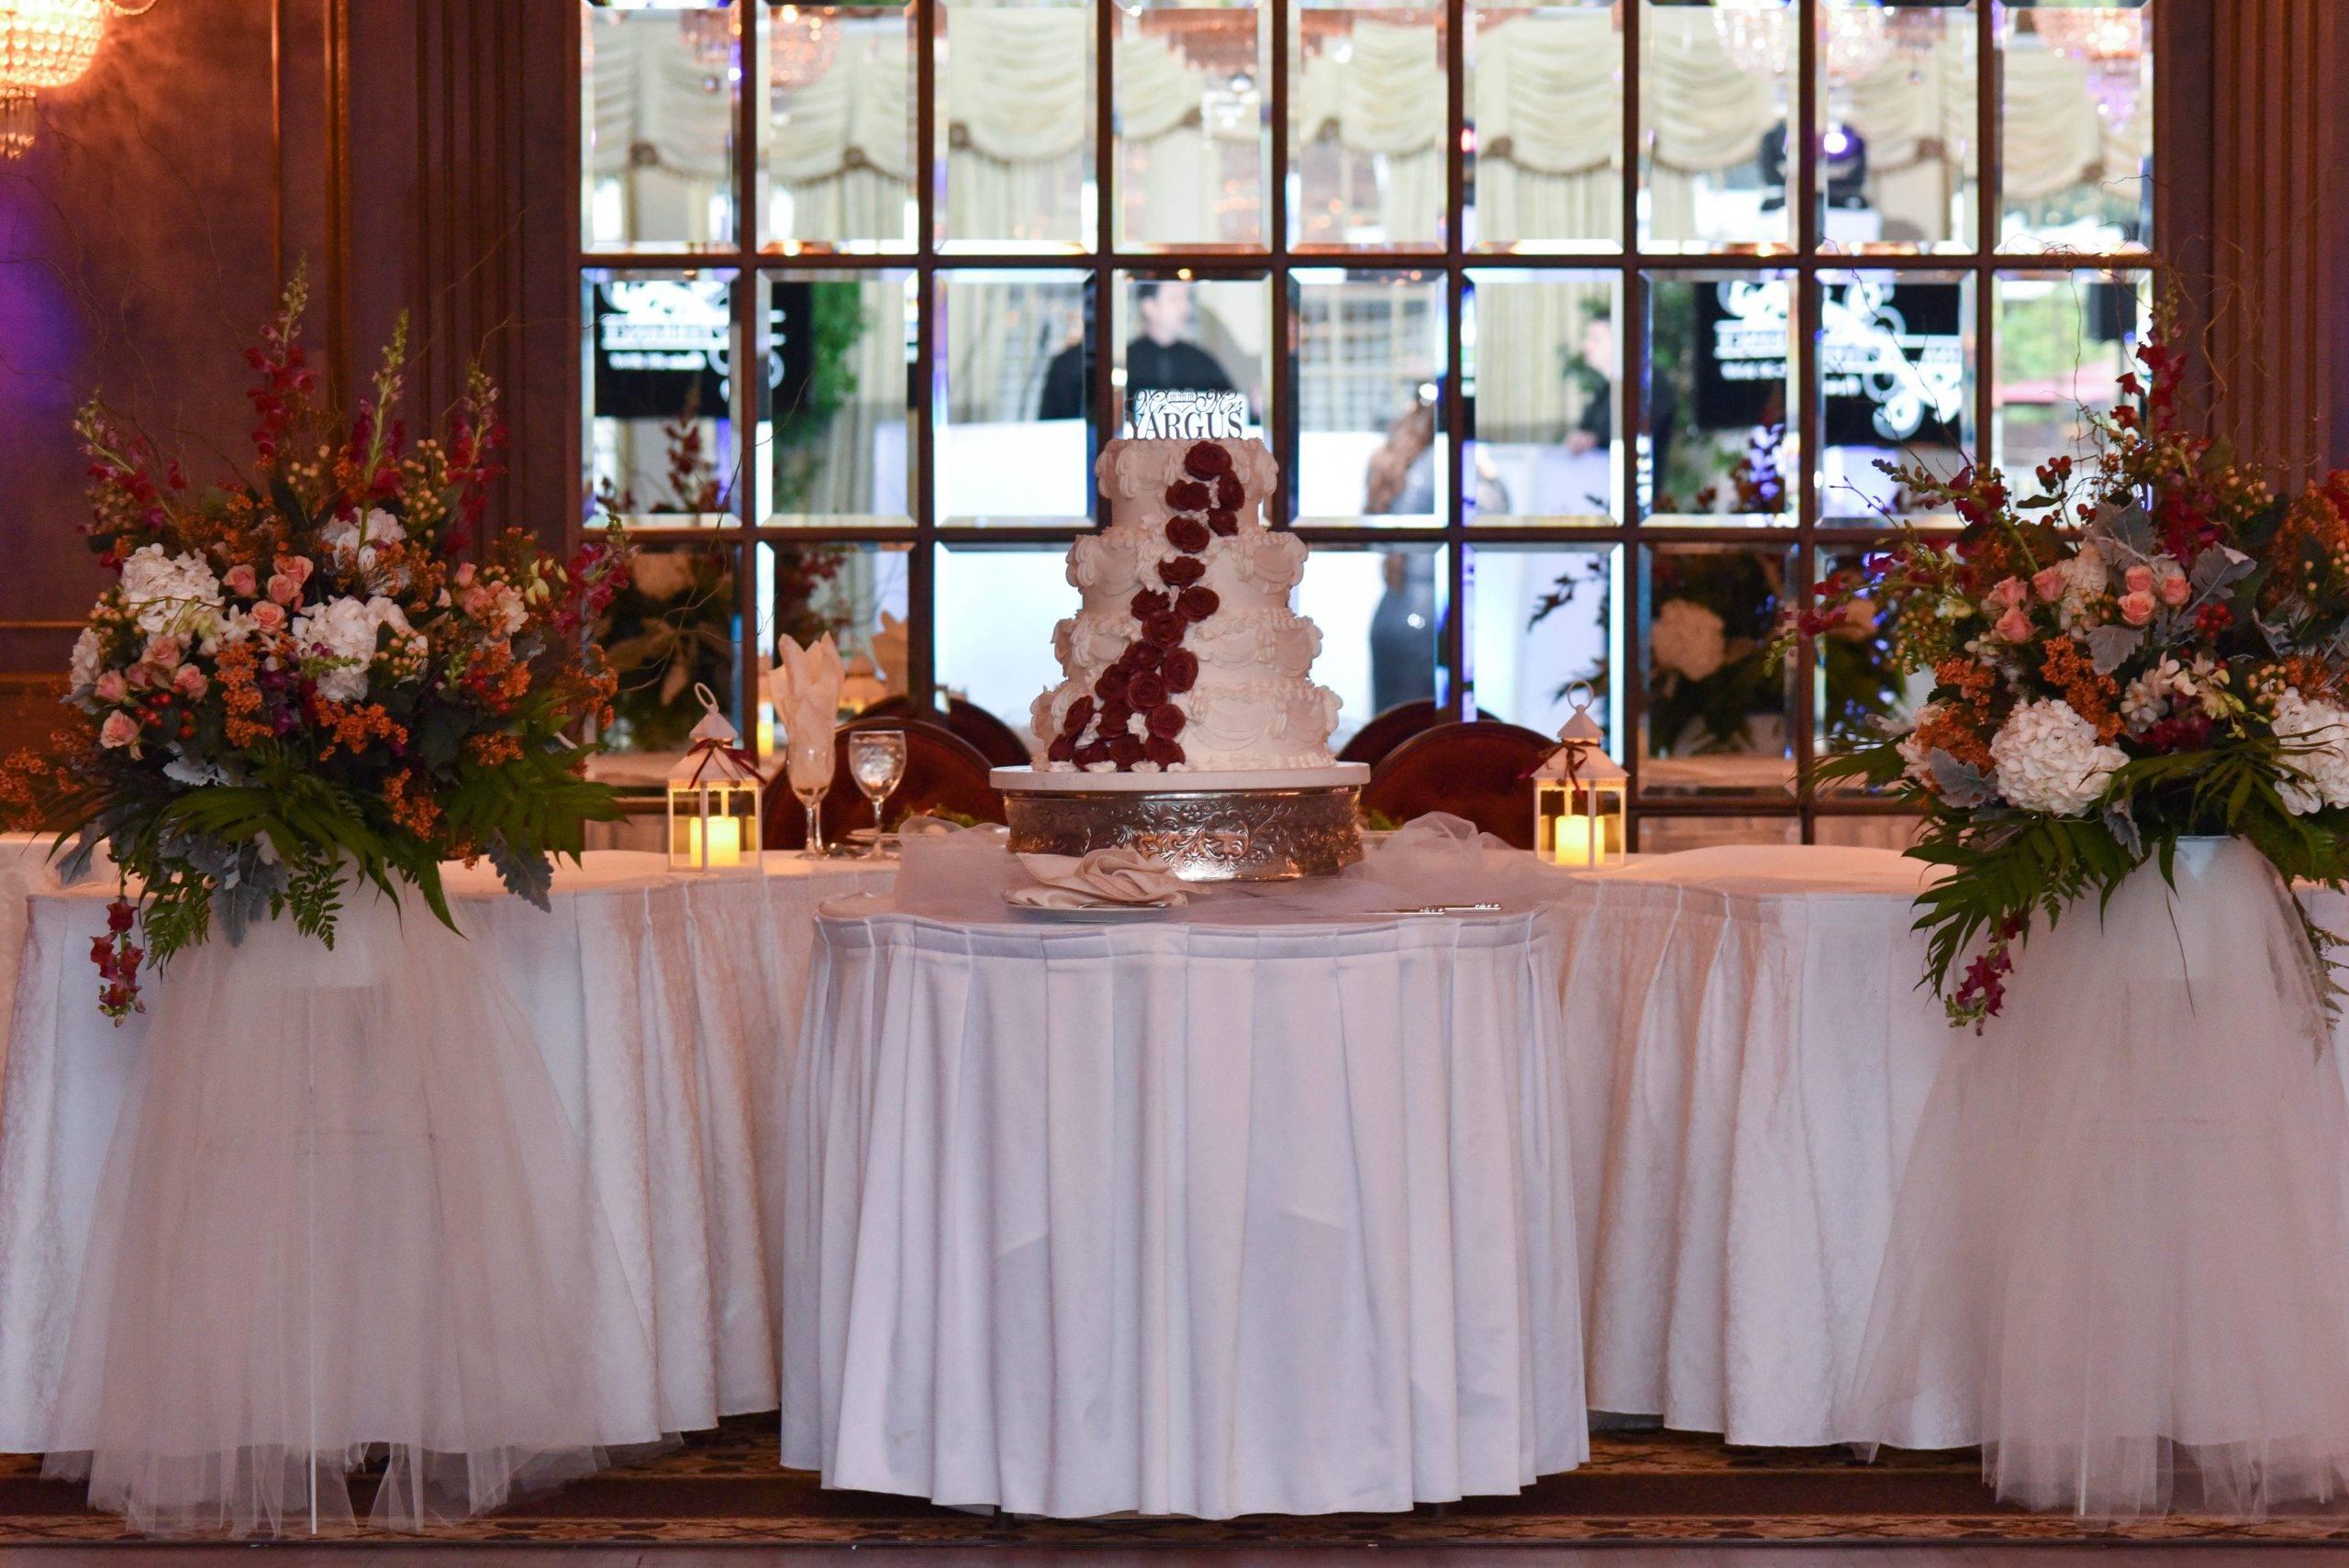 Birchwood Manor wedding cake